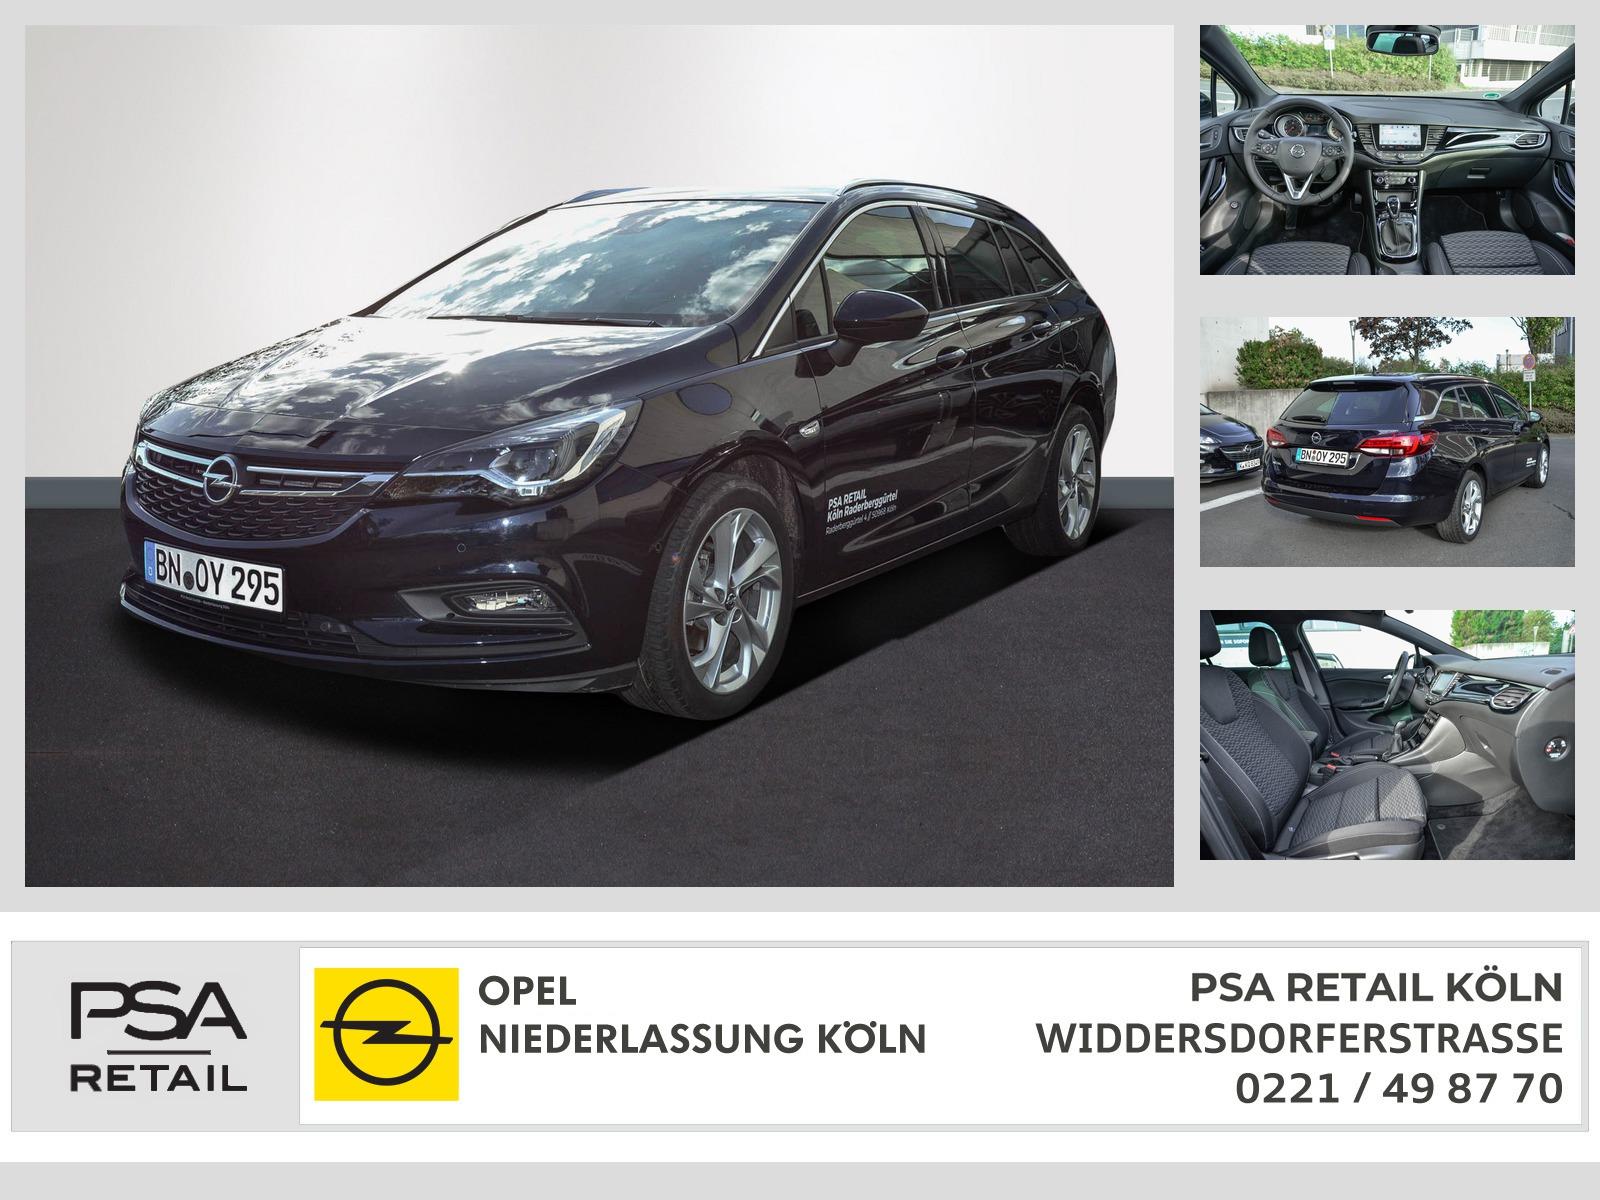 Opel Astra Sports Tourer 1.4 Turbo Business Edition, Park&Go, Jahr 2019, Benzin